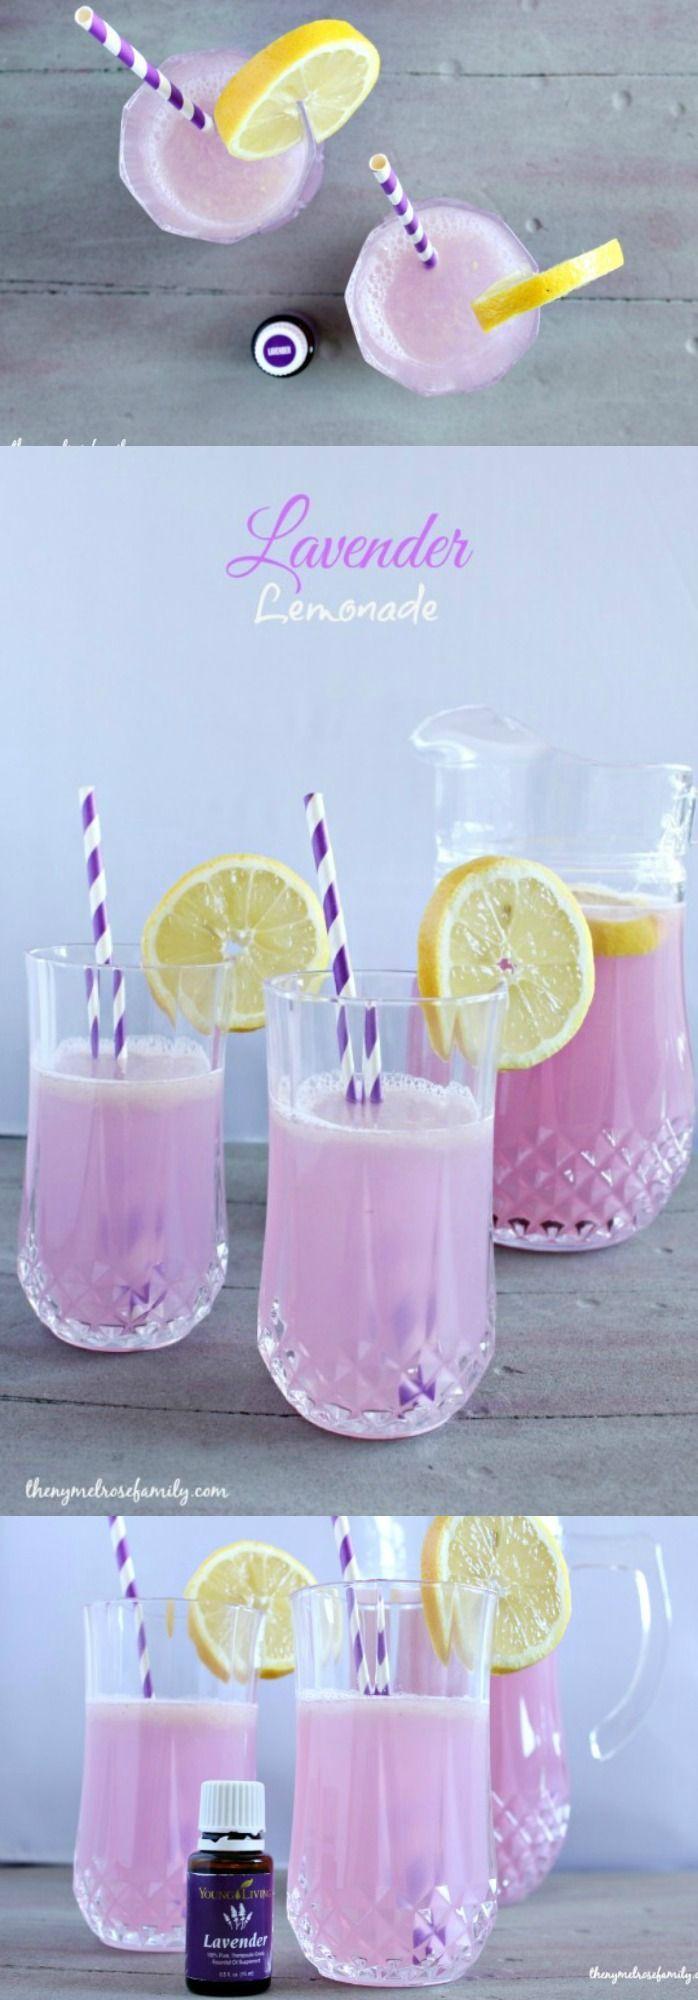 Lavender Lemonade     http://thenymelrosefamily.com/2015/03/lavender-lemonade.html#_a5y_p=3474114